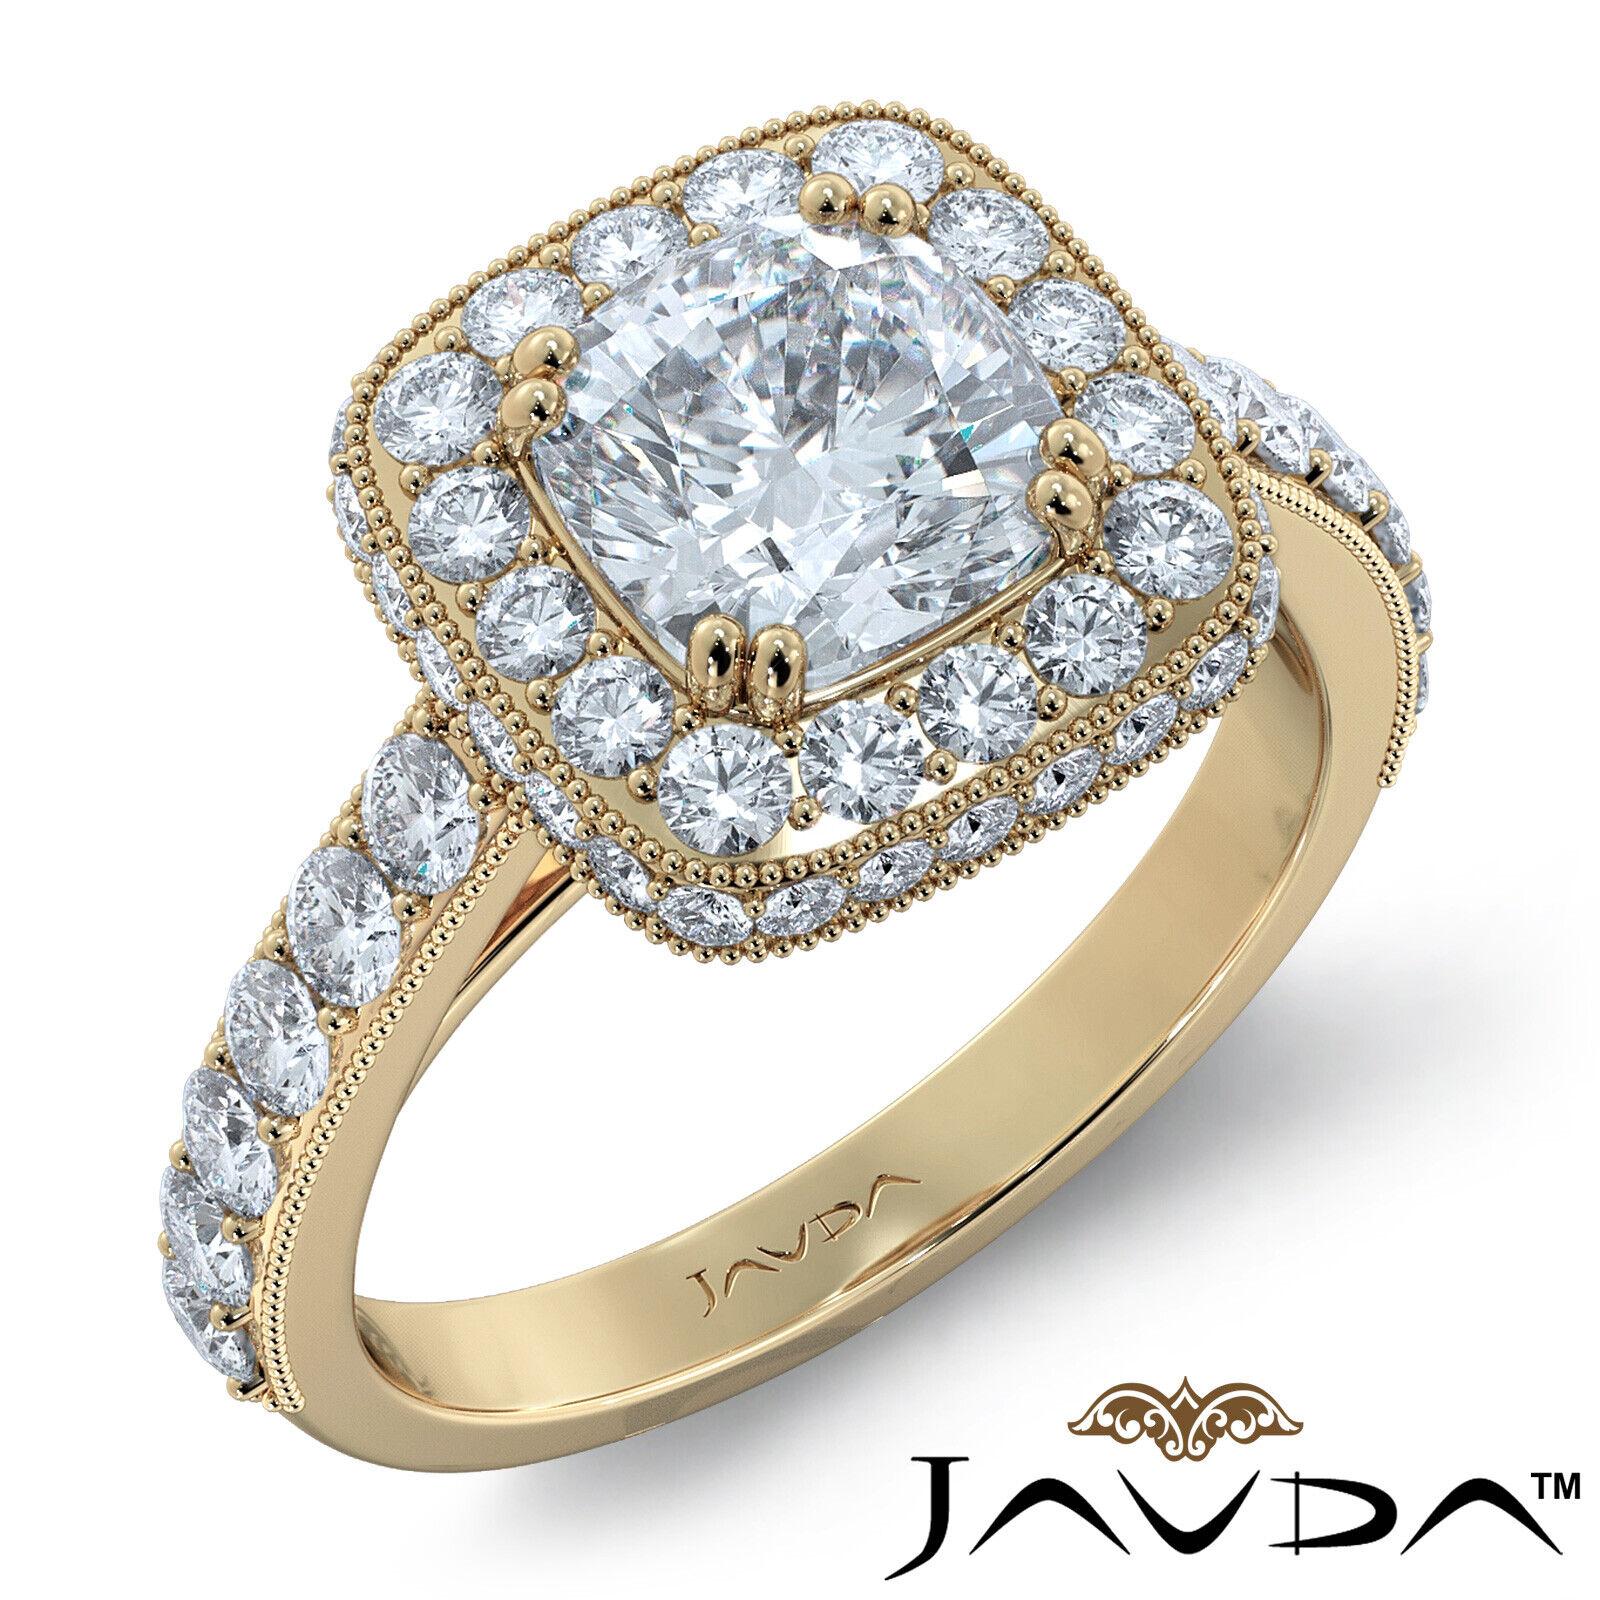 2.12ctw Milgrain Floral Basket Cushion Diamond Engagement Ring GIA I-SI2 W Gold 7